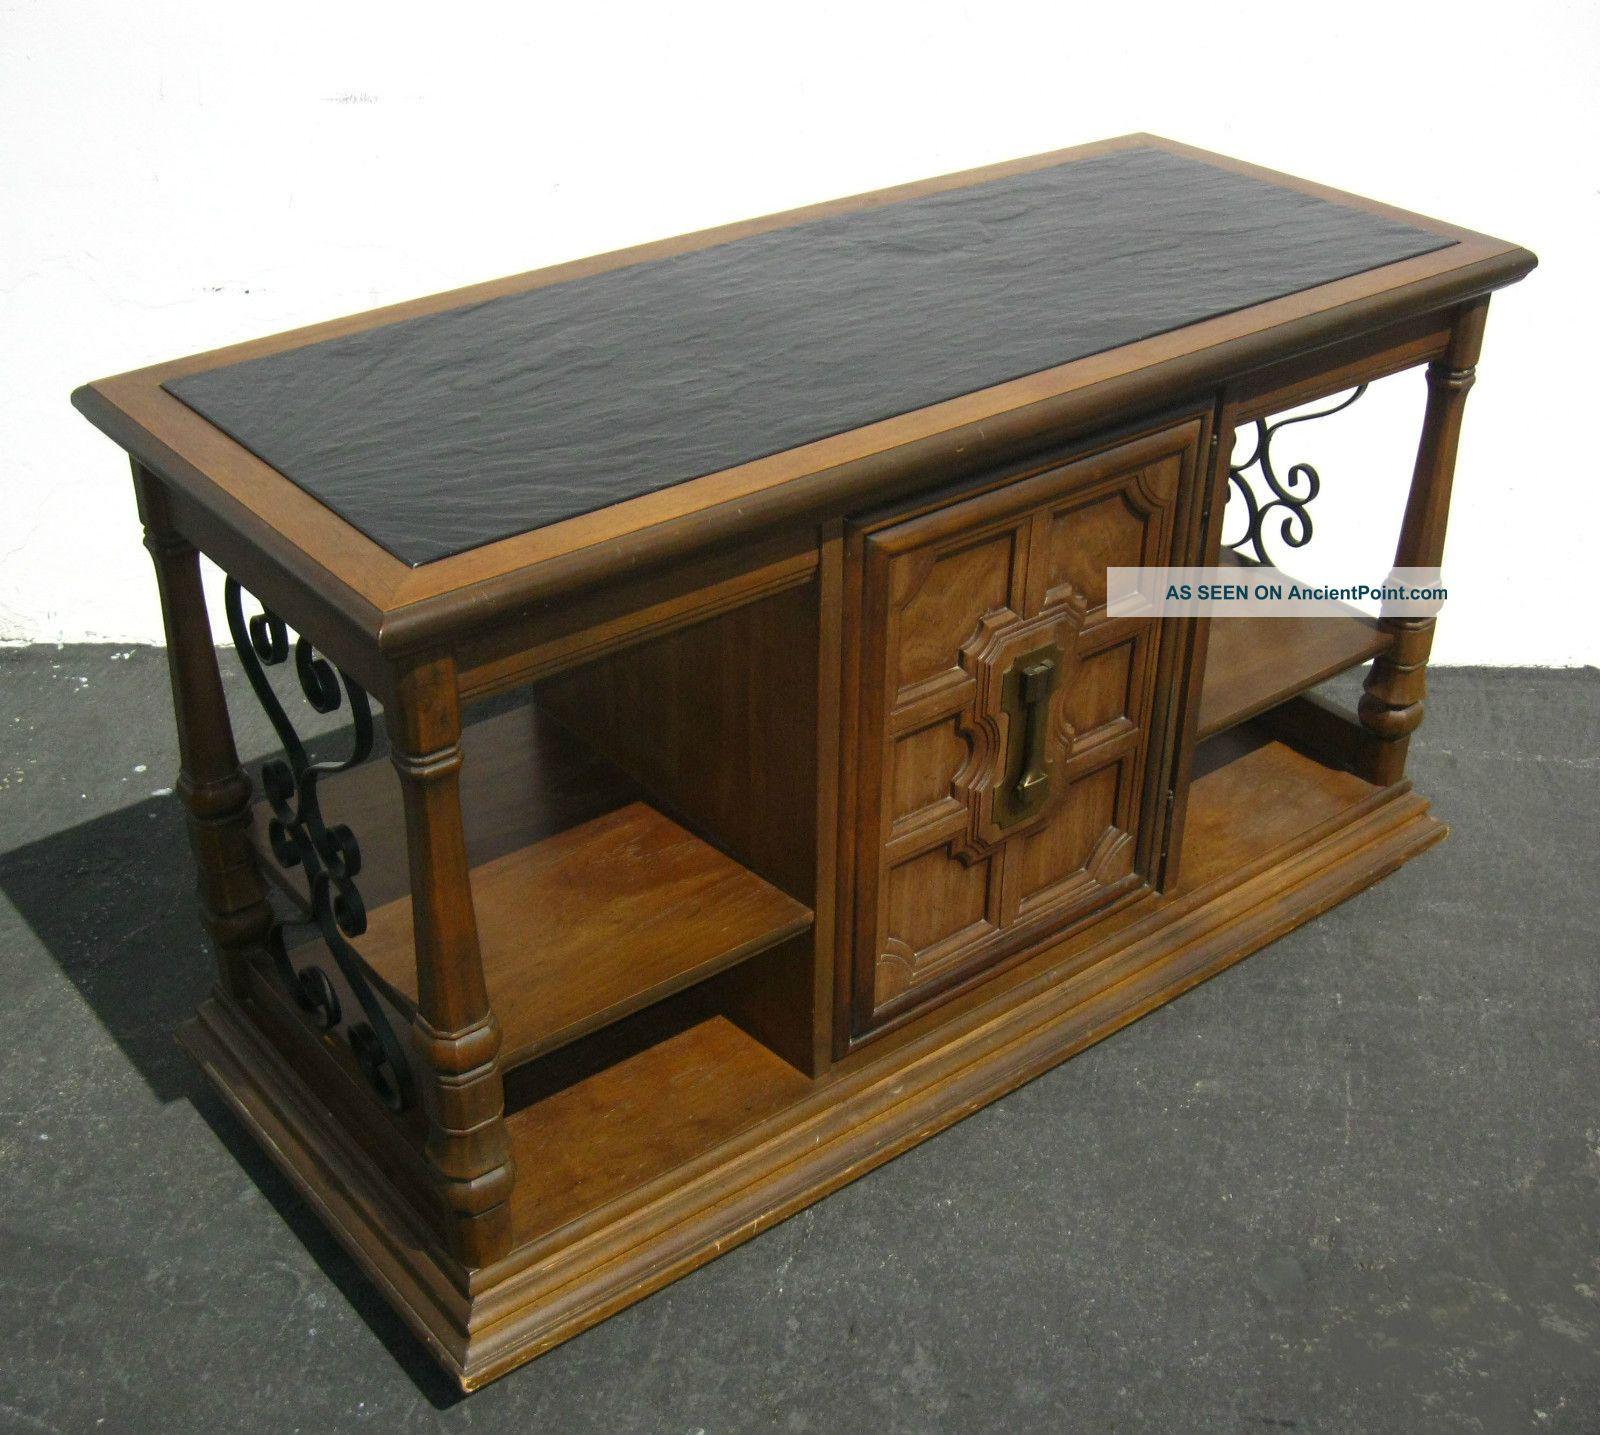 Vintage Spanish Style Wrought Iron Slate Server Buffet Entry Table Mid Century 1900-1950 photo